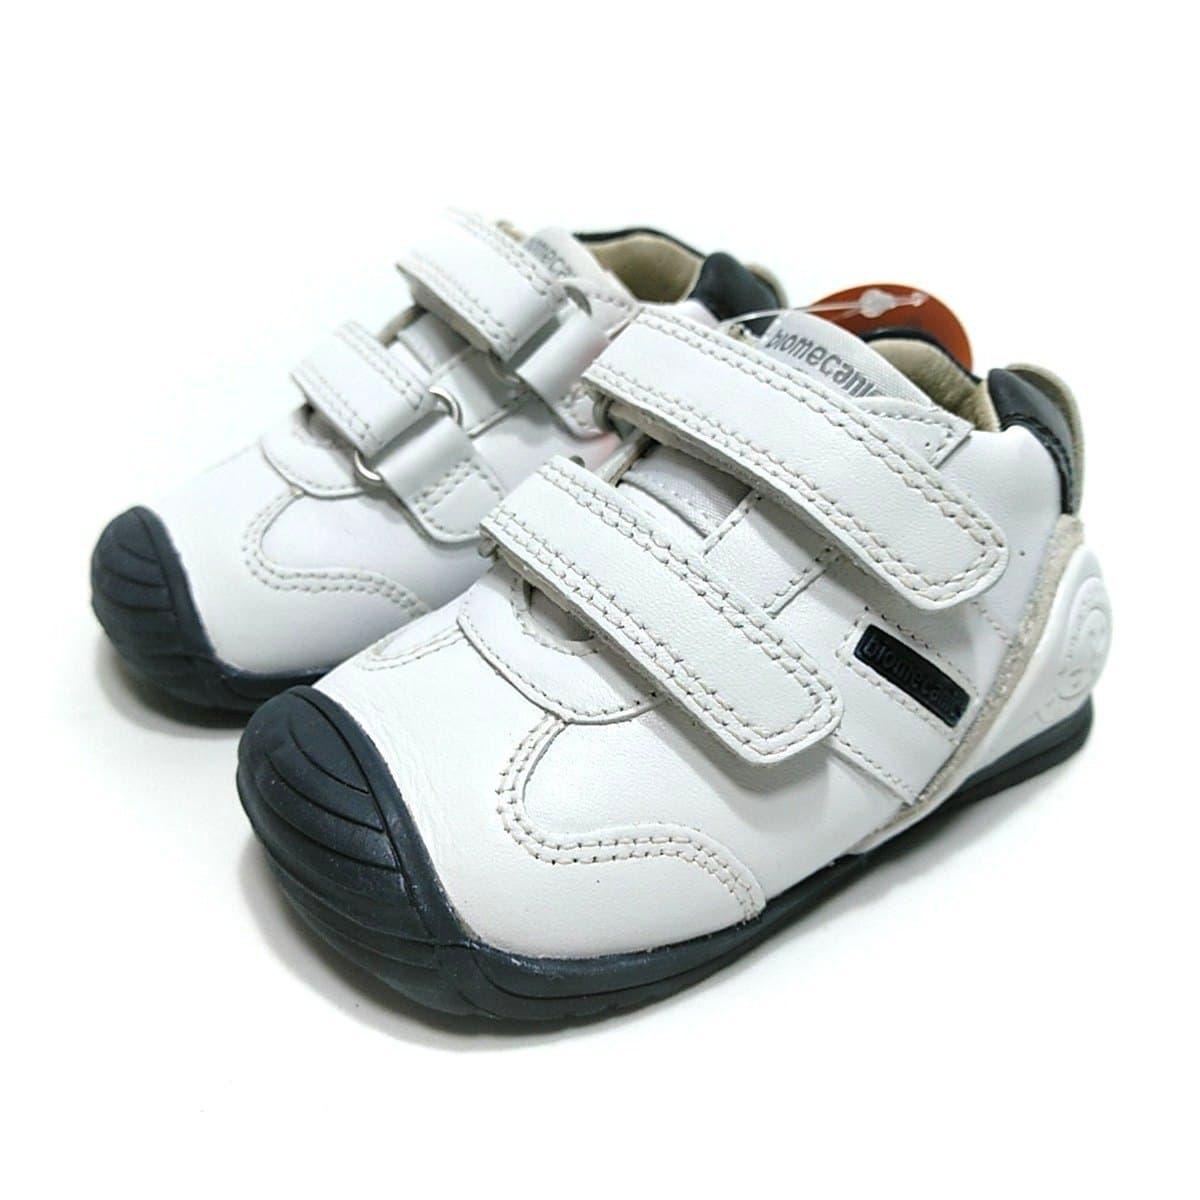 fd203e2e310aa Biomecanics deportivo bebé piel blanco marino de niño doble velcro